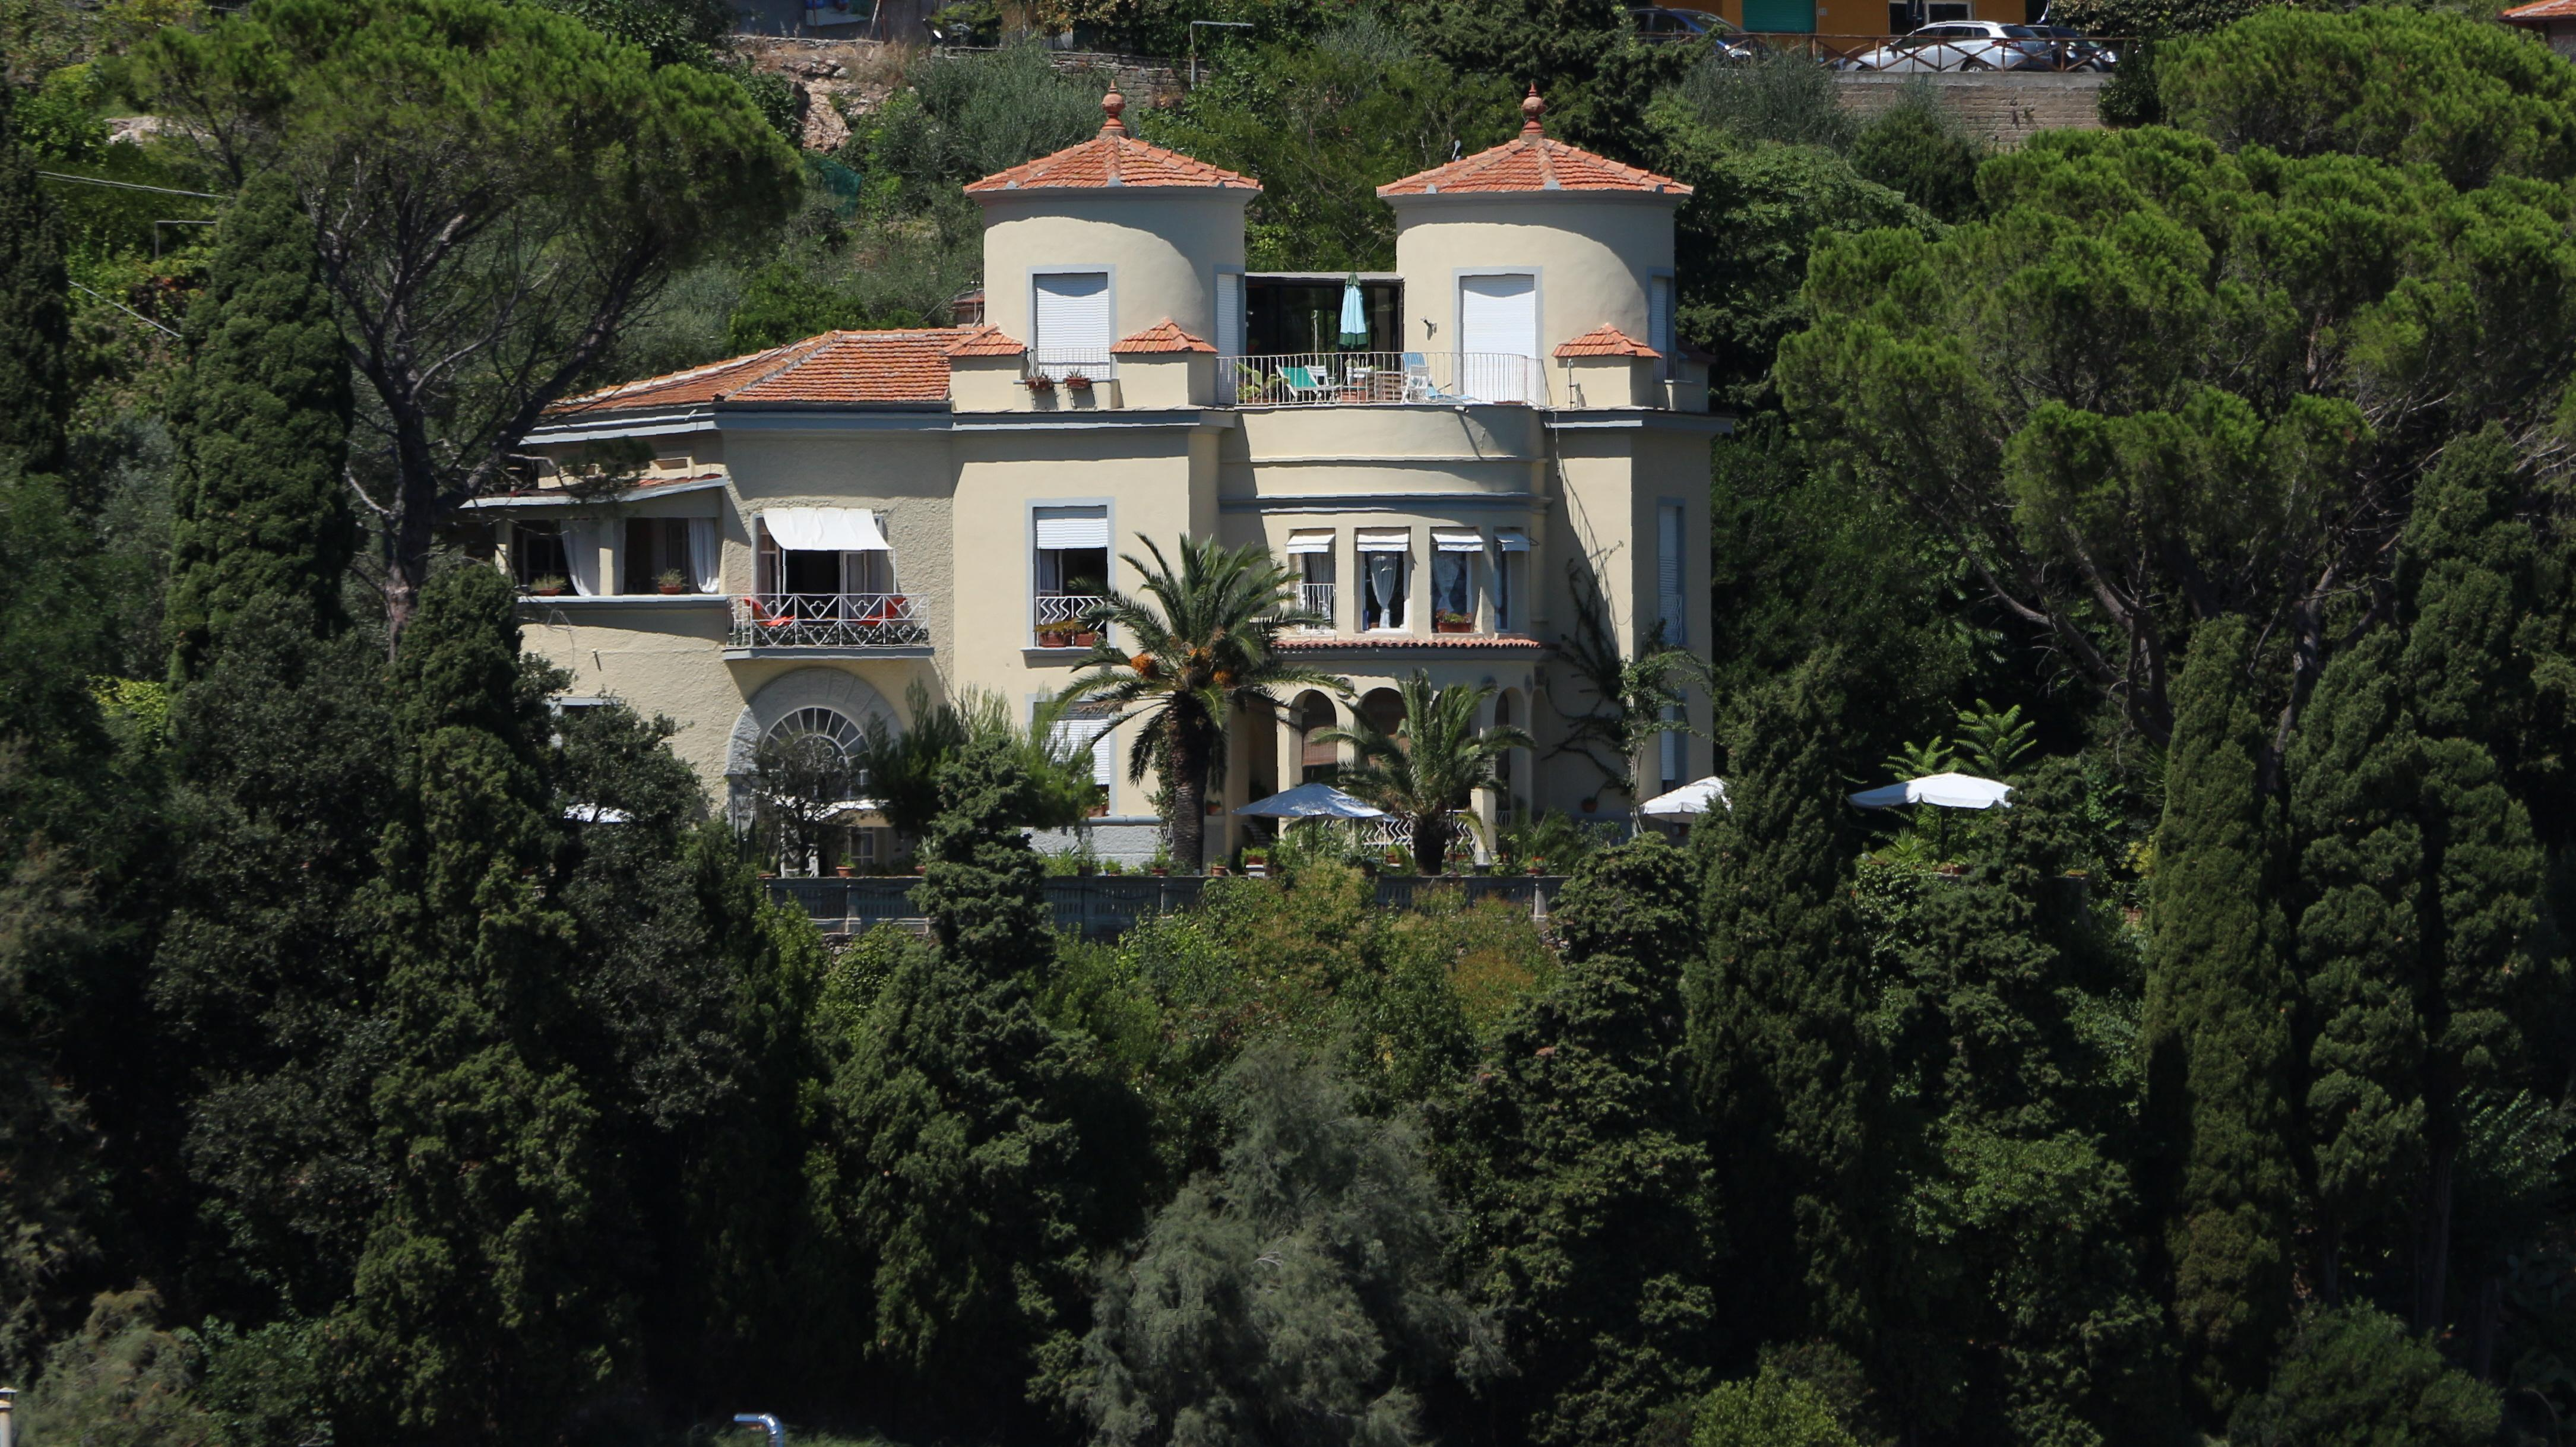 Villa Ansedonia Maria De Filippi Sigarette